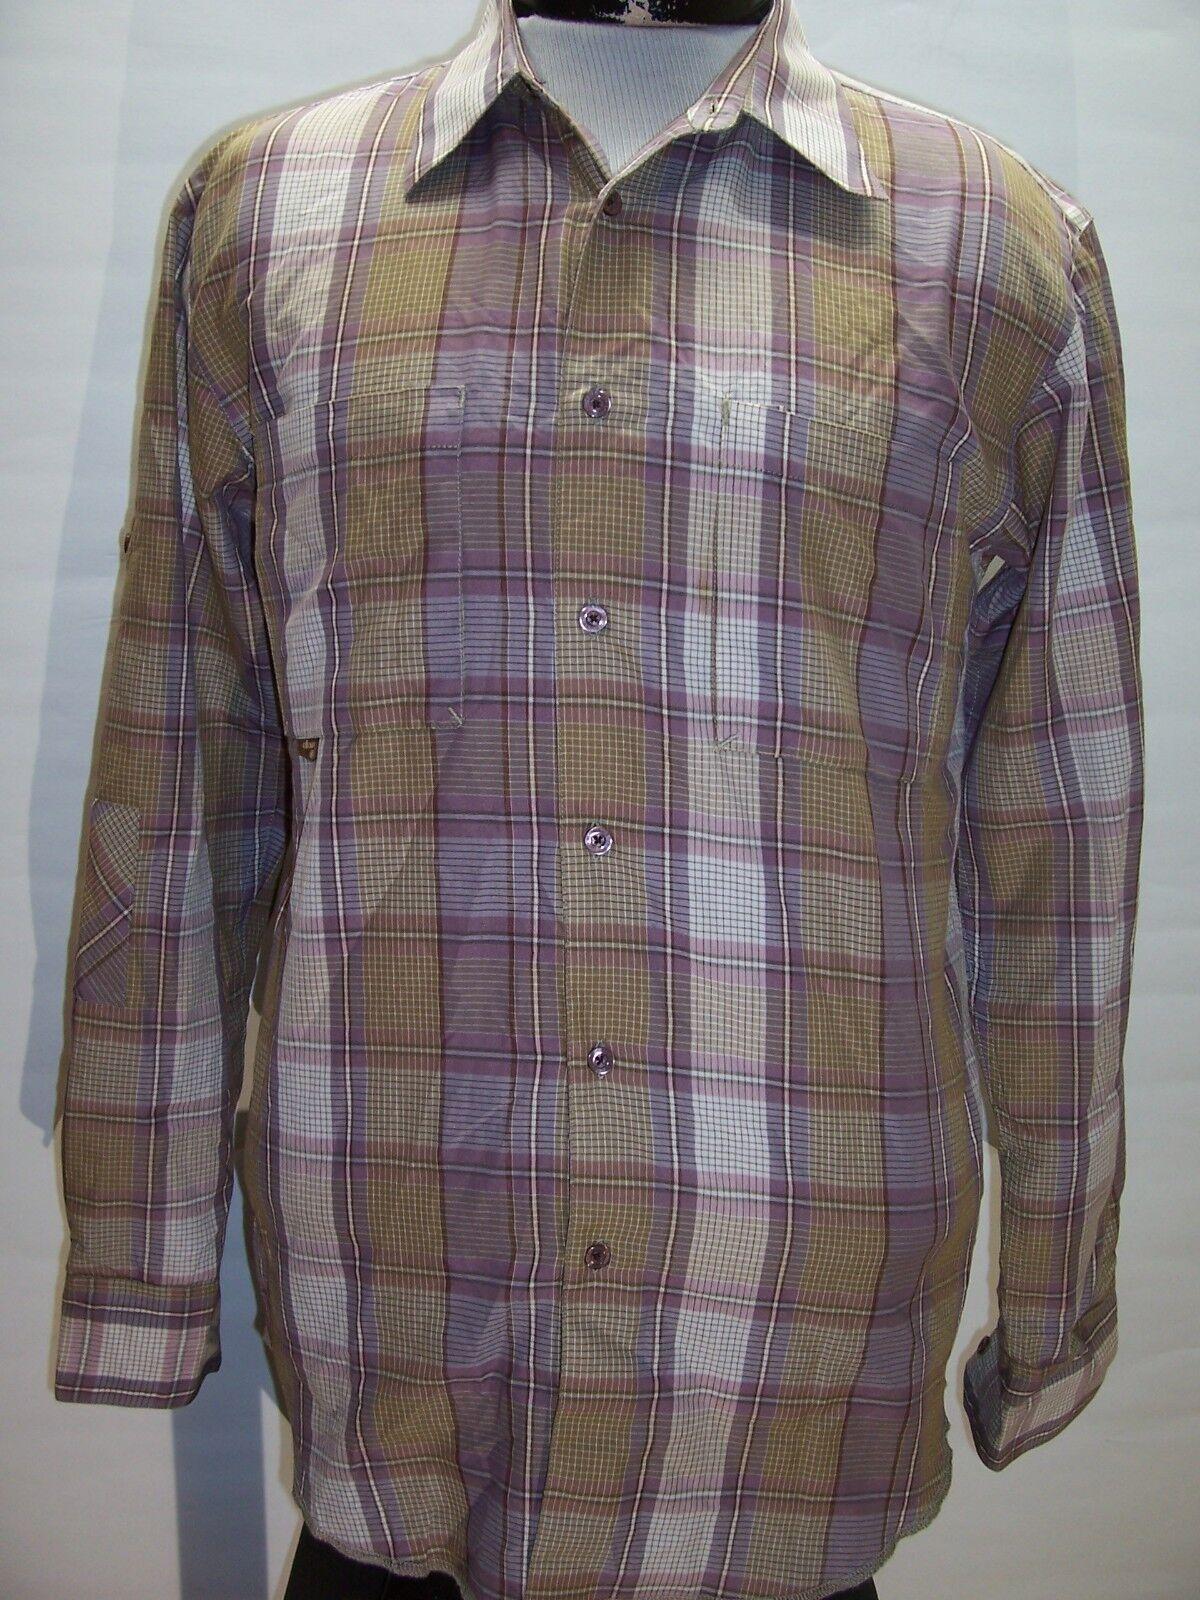 ELEMENT medium M Button-up shirt Combined ship discounts